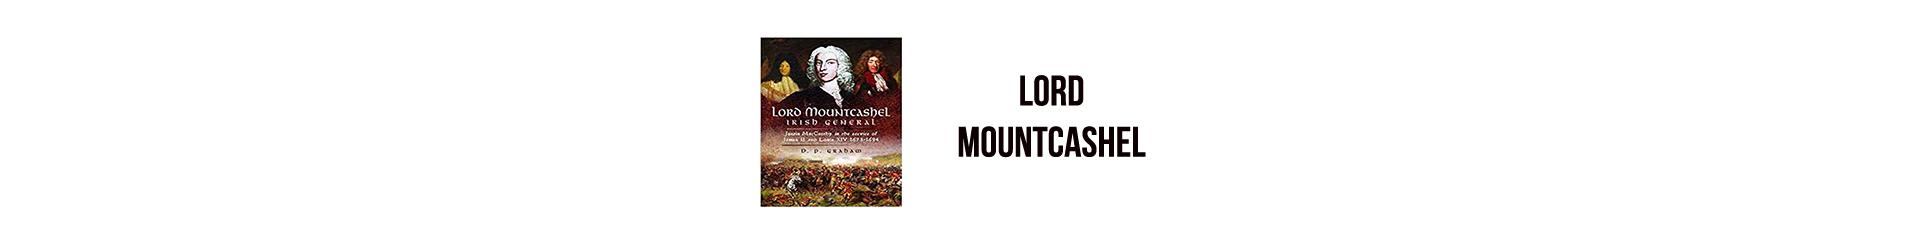 Lord Mountcashel: Irish General 1673 – 1694, by D.P Graham